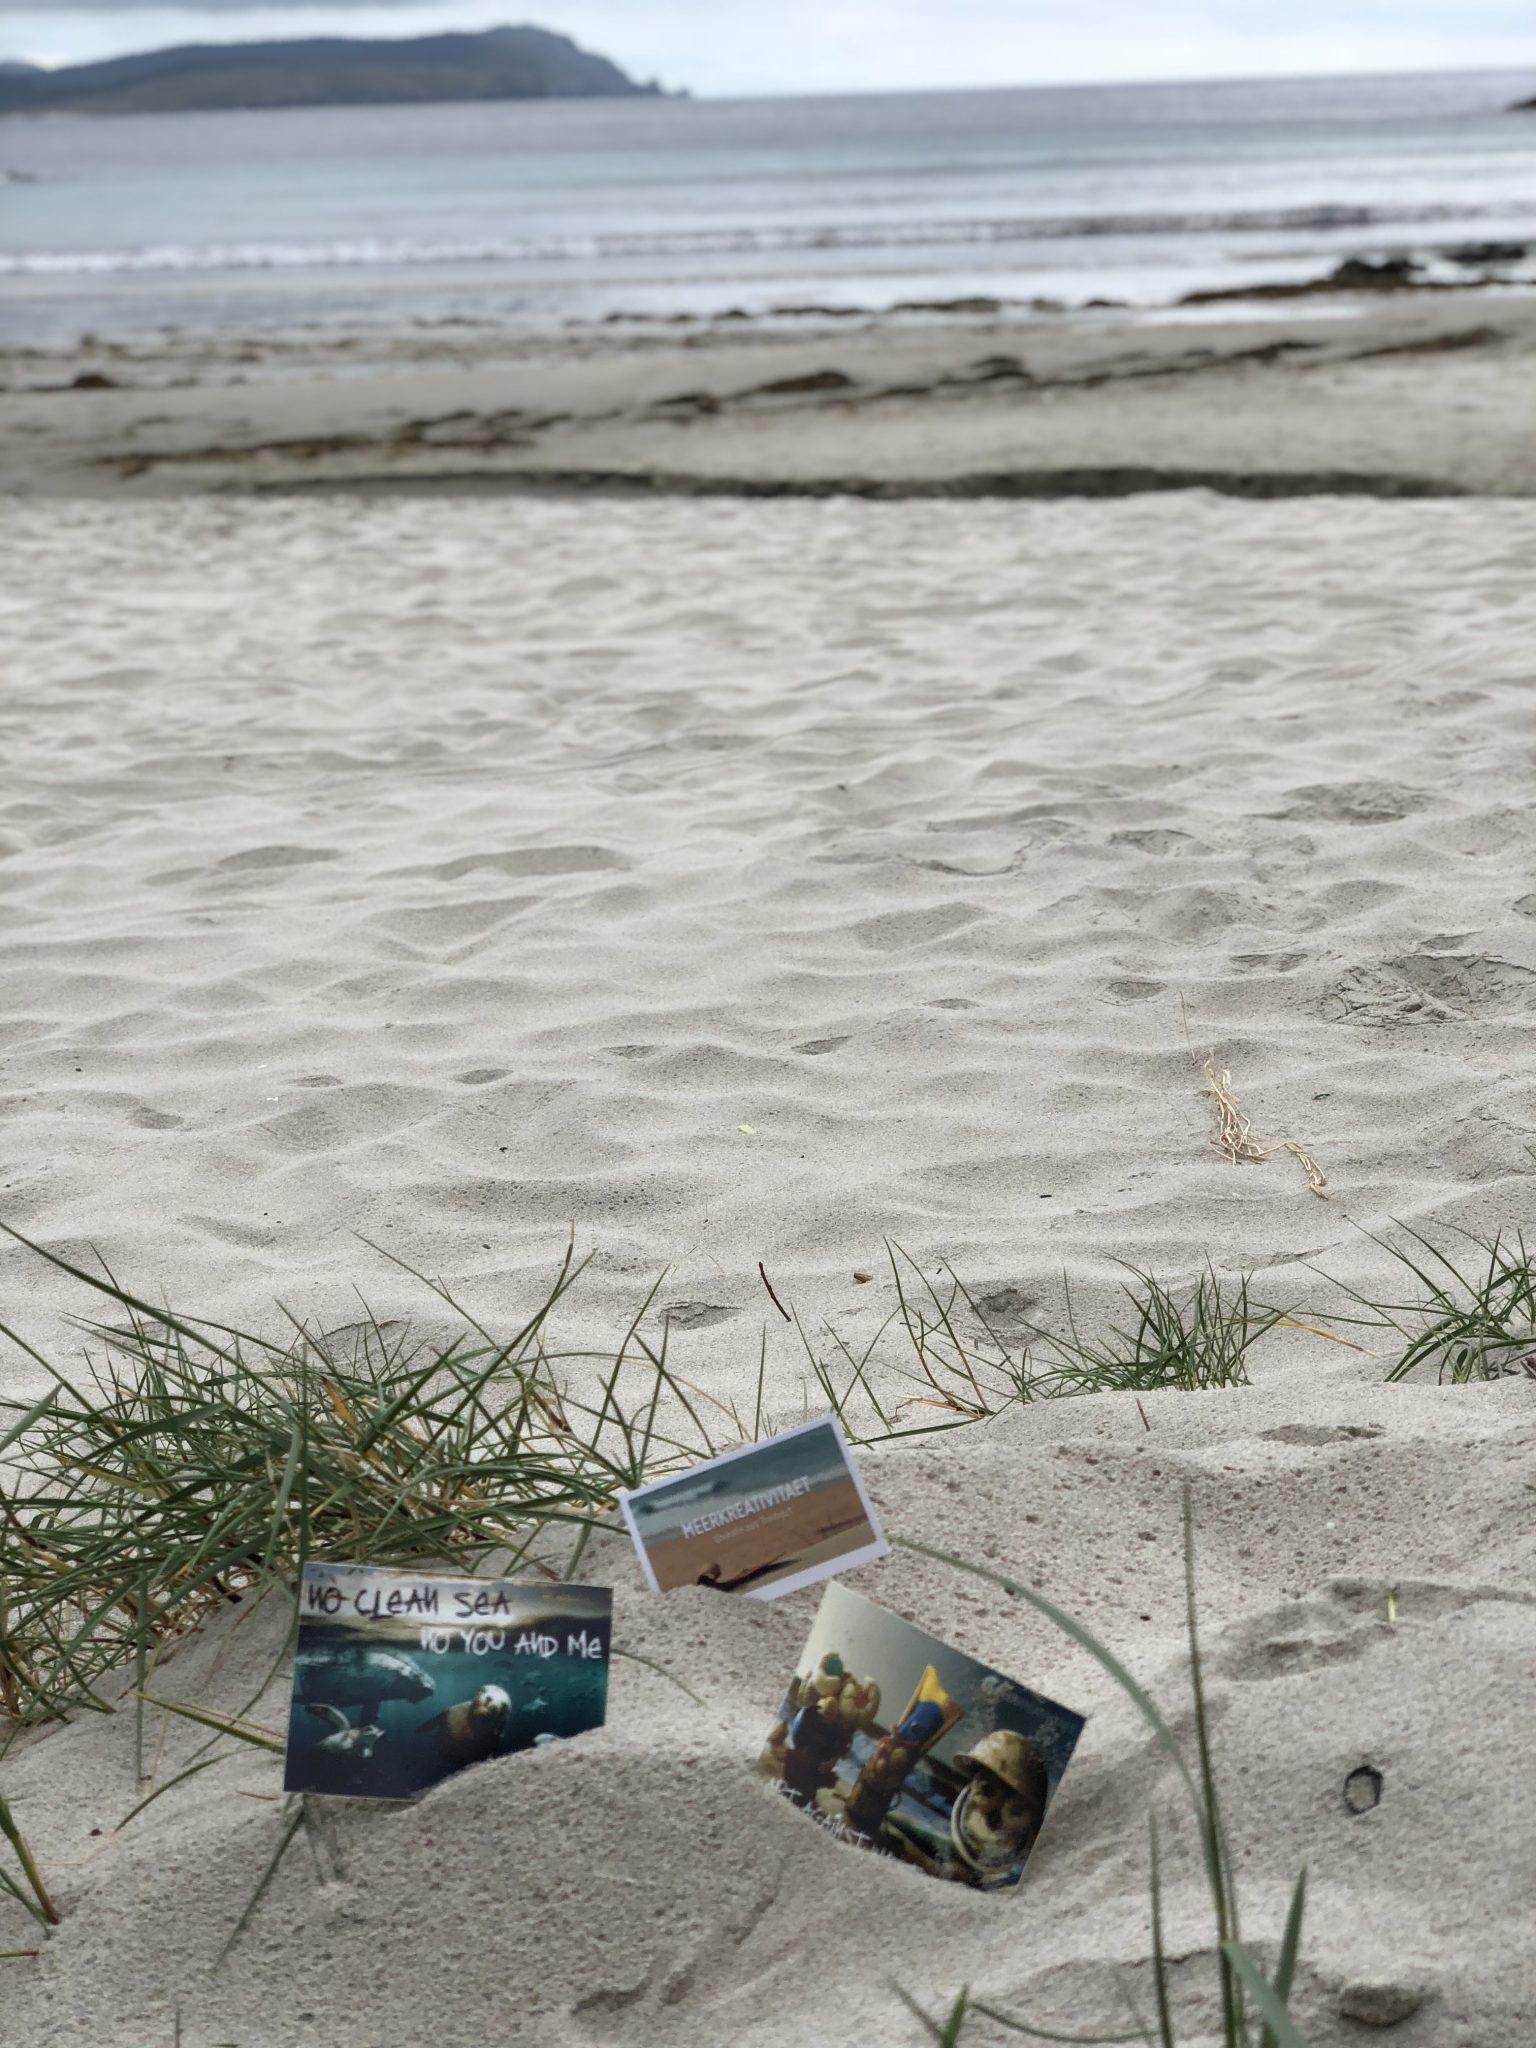 Nachher: Ein sauberer Strand. Playa Nemiña, Spanien.